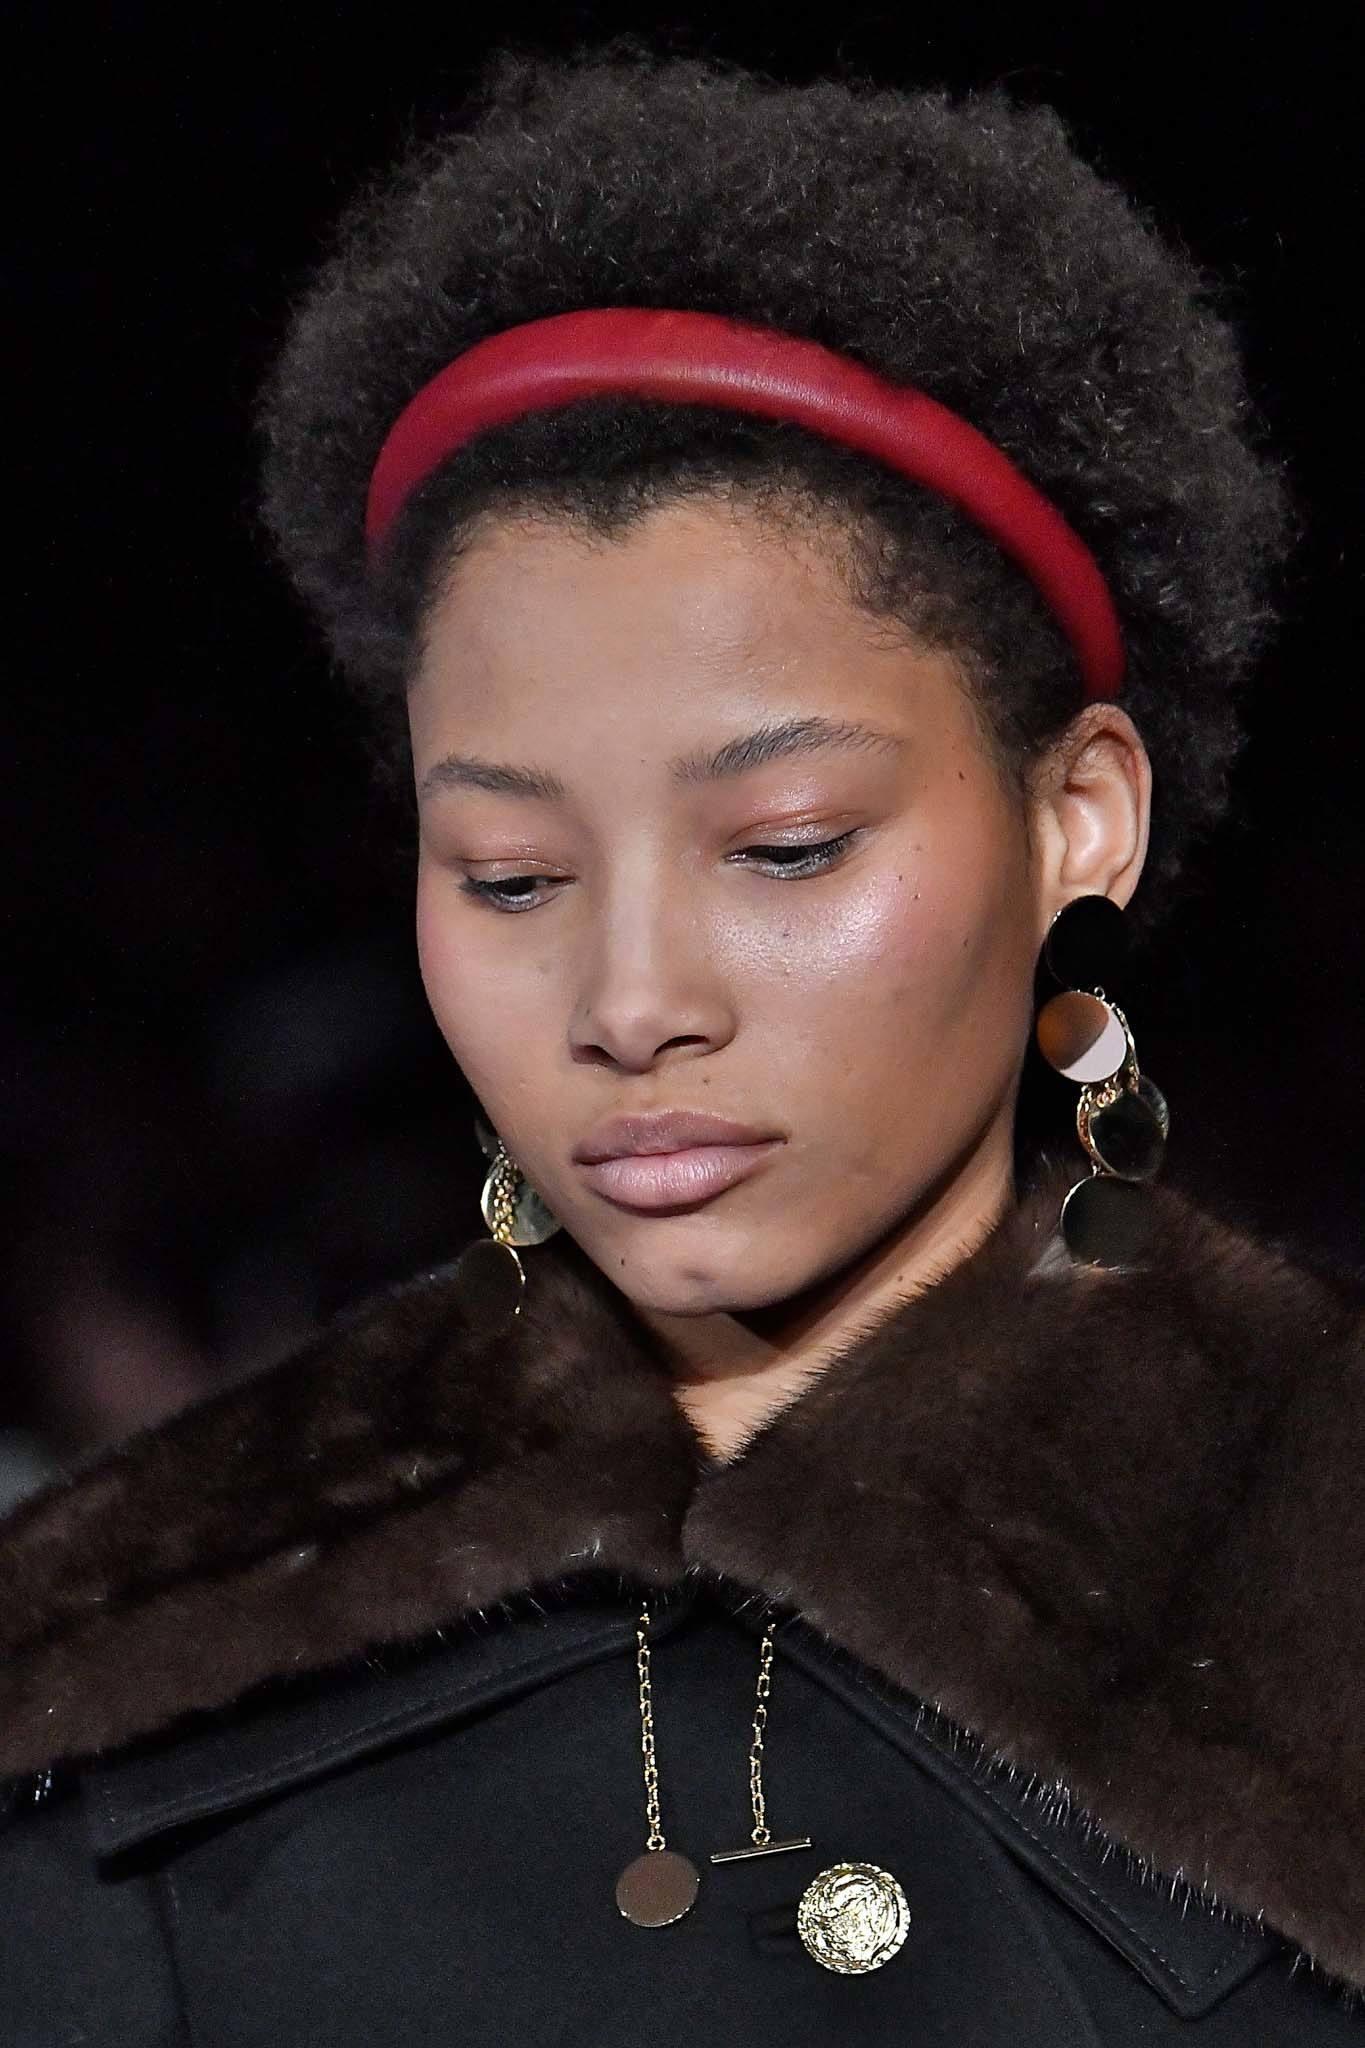 accessorize pixie cuts red headband